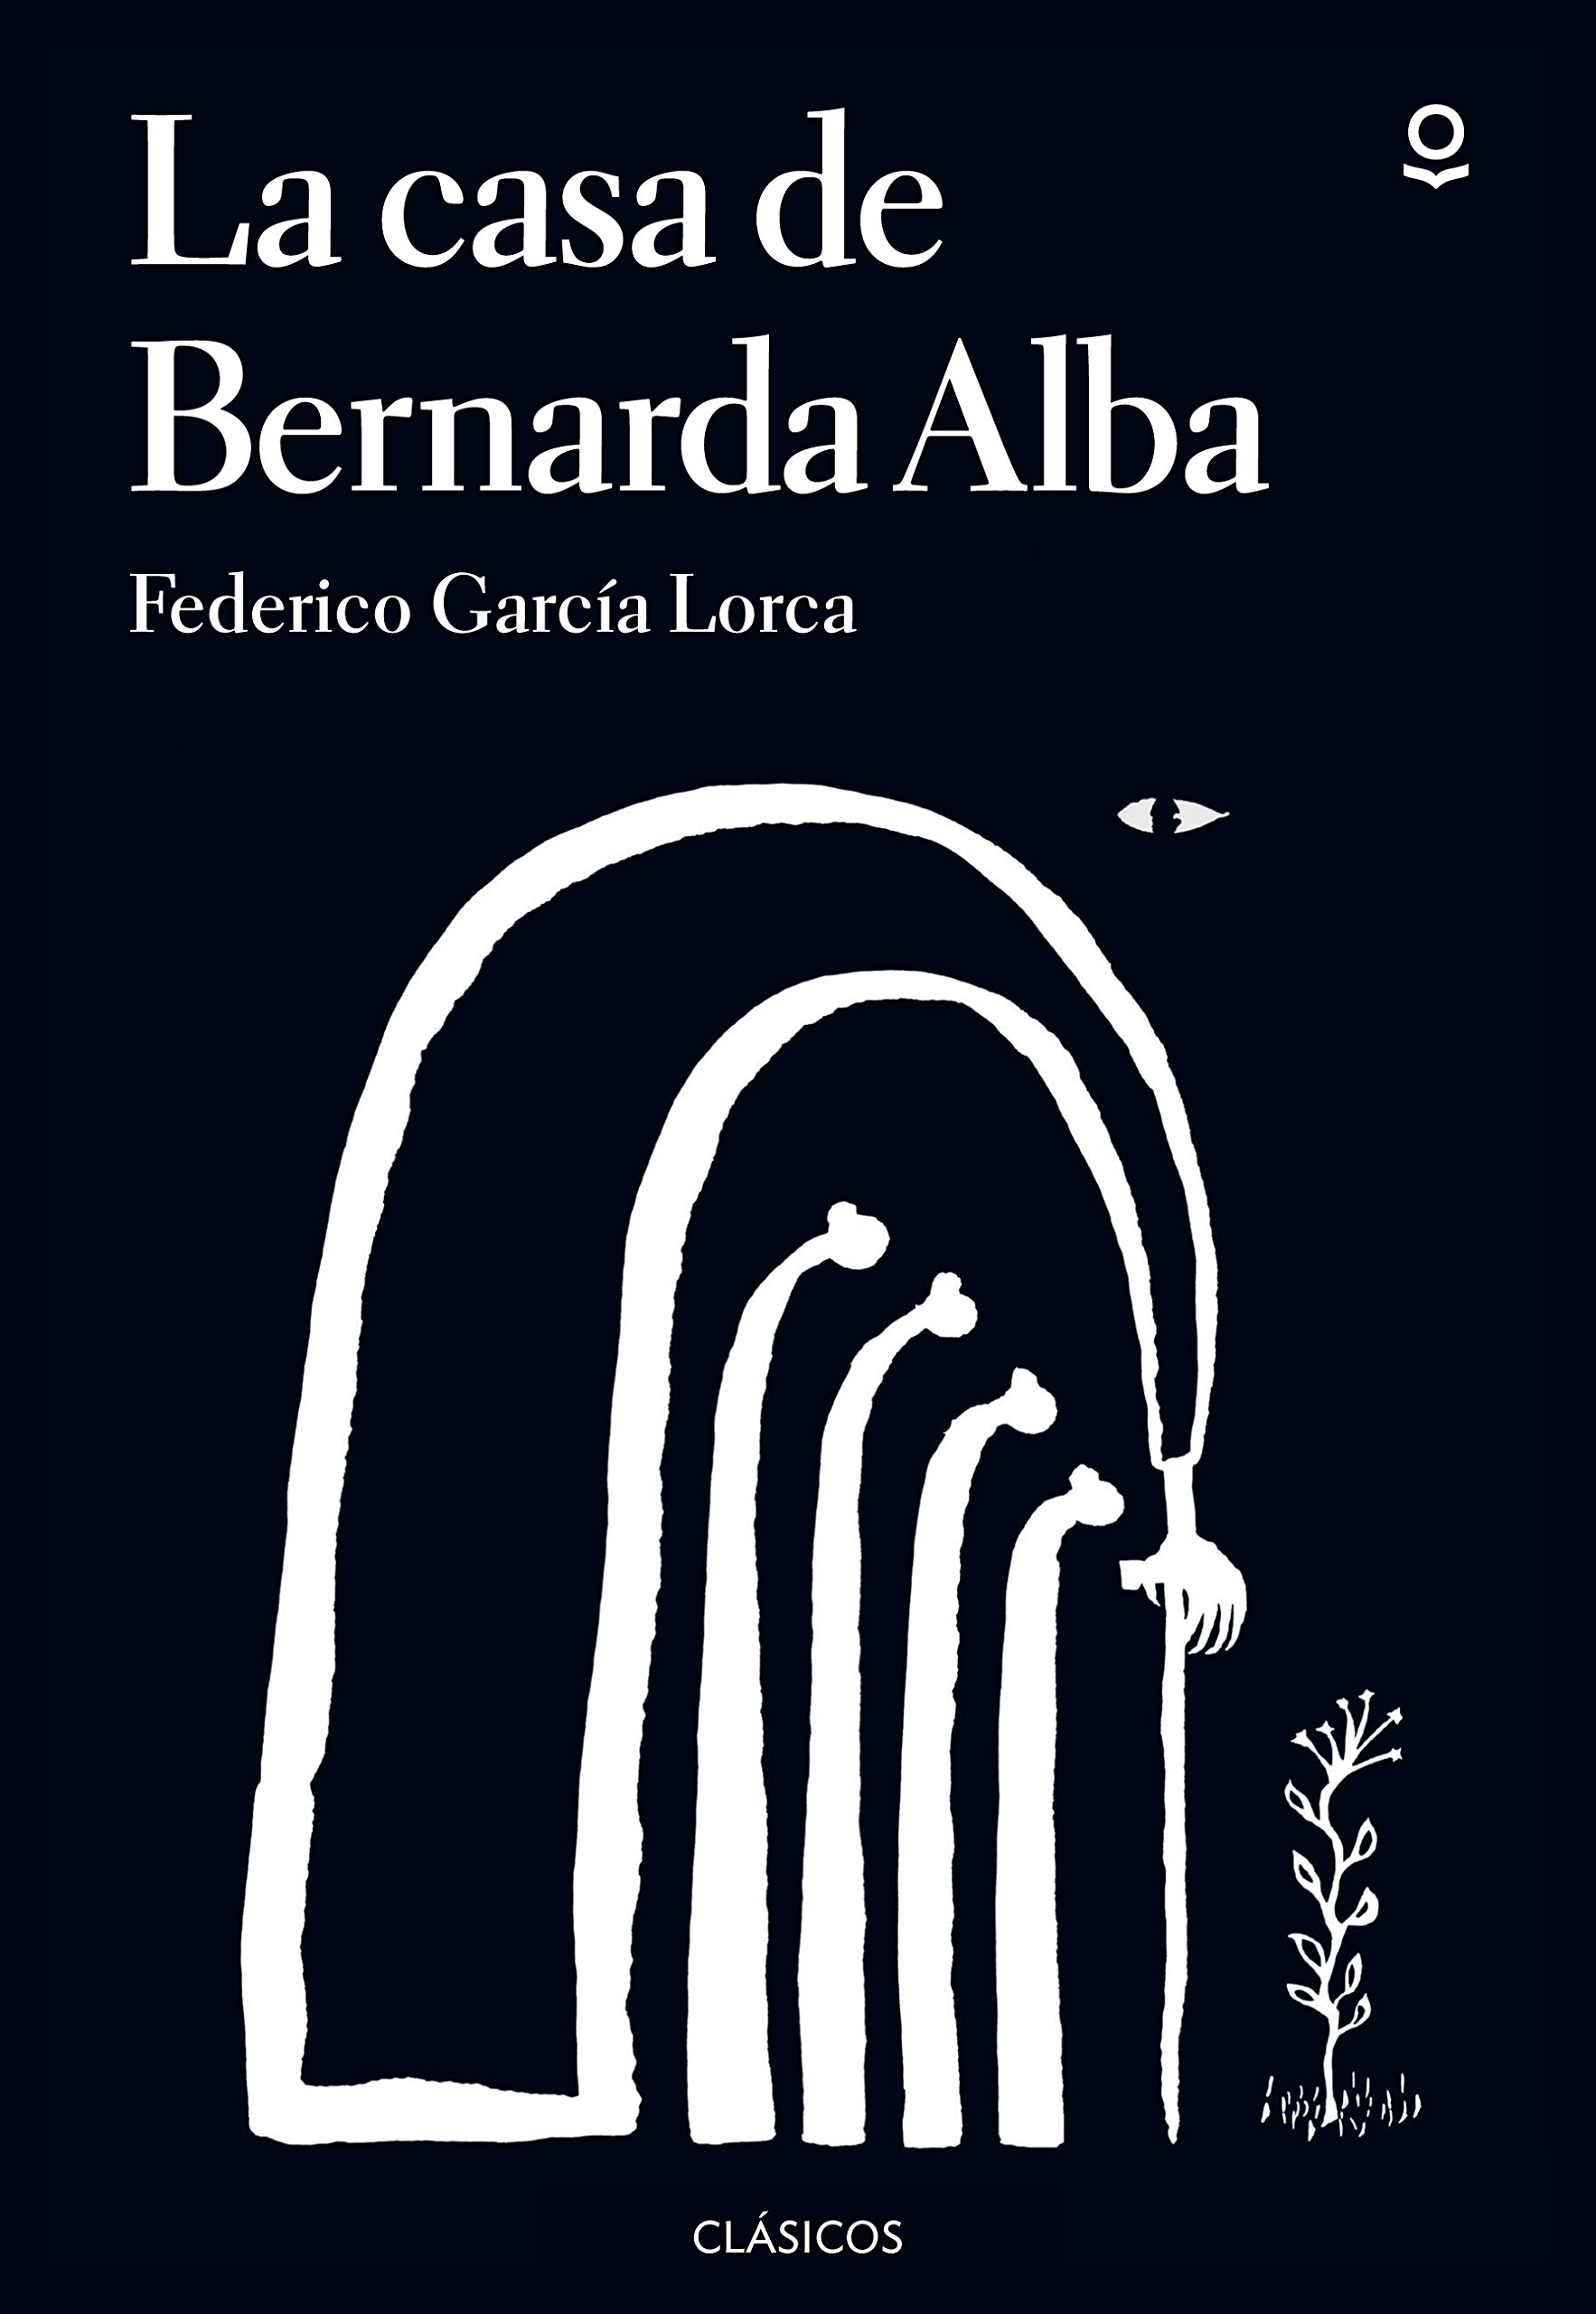 La casa de Bernarda Alba (annotated ed. 2017) (Spanish) Paperback – 2017